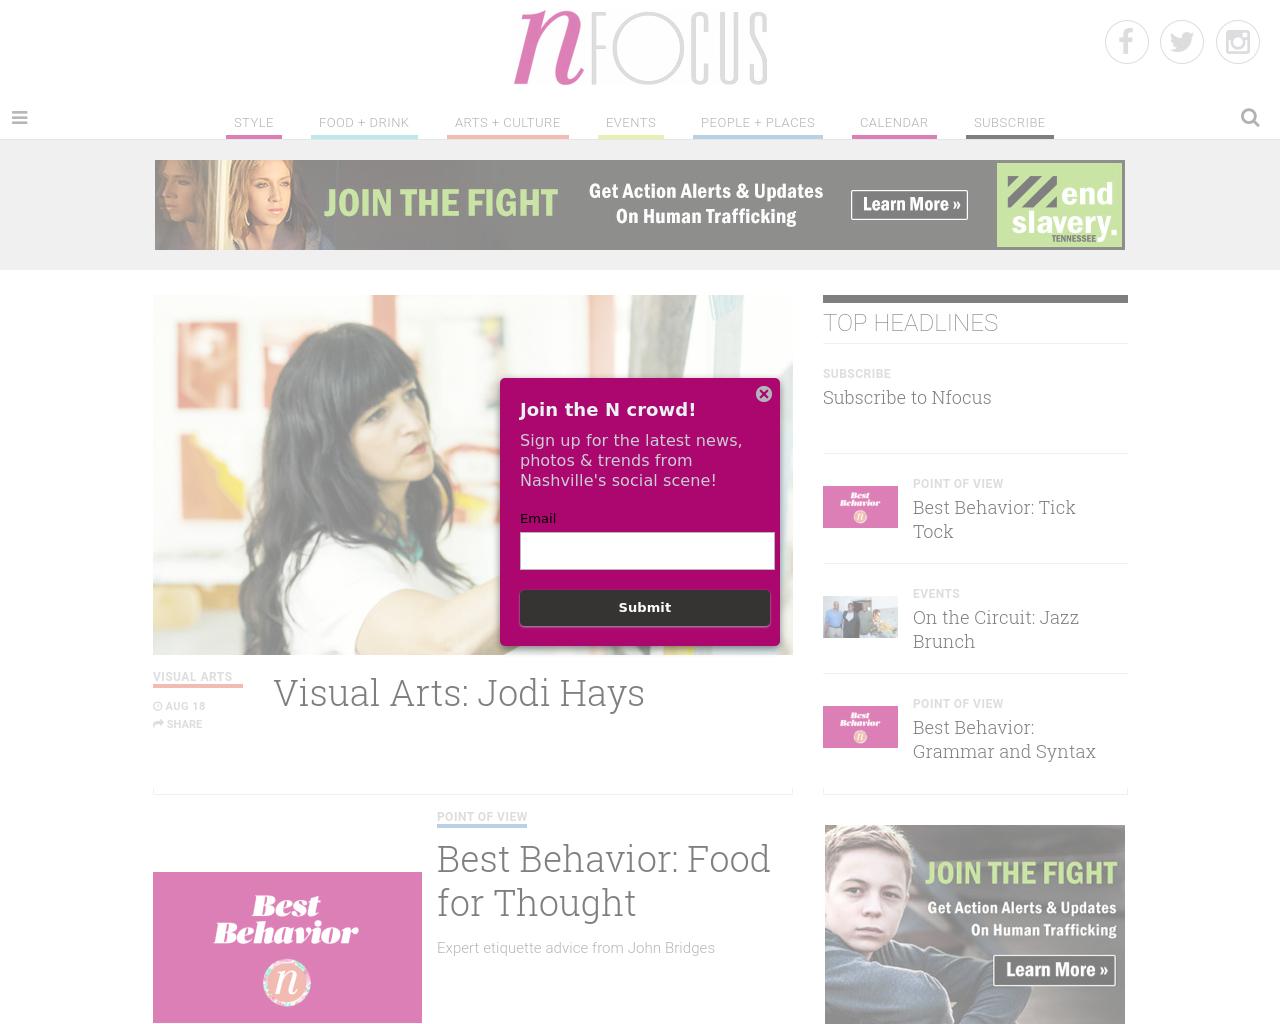 Nfocus-Advertising-Reviews-Pricing